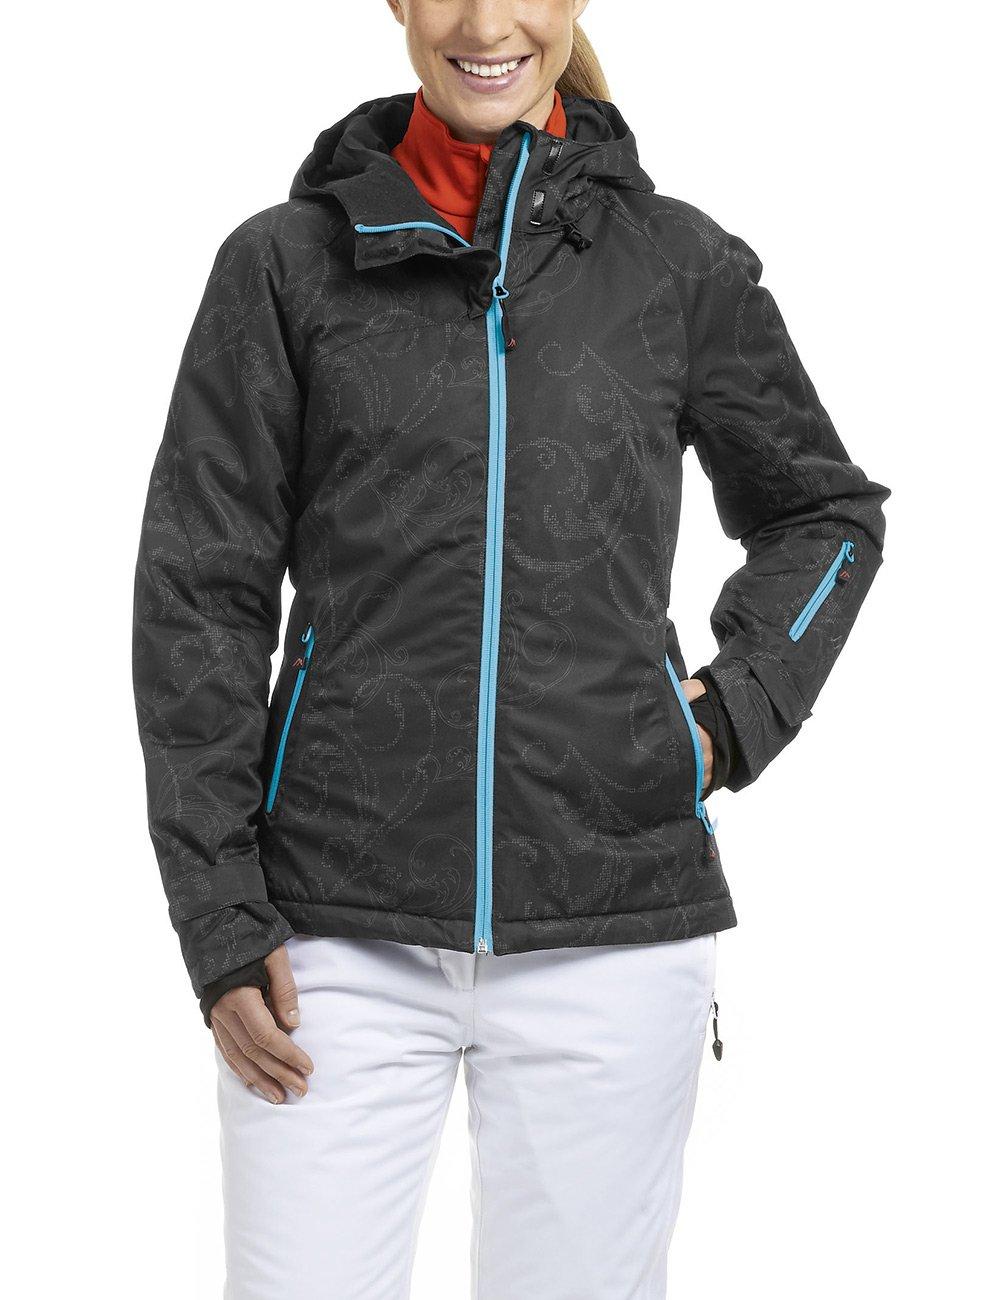 maier sports Damen Skijacke Wattiert Amelia jetzt bestellen